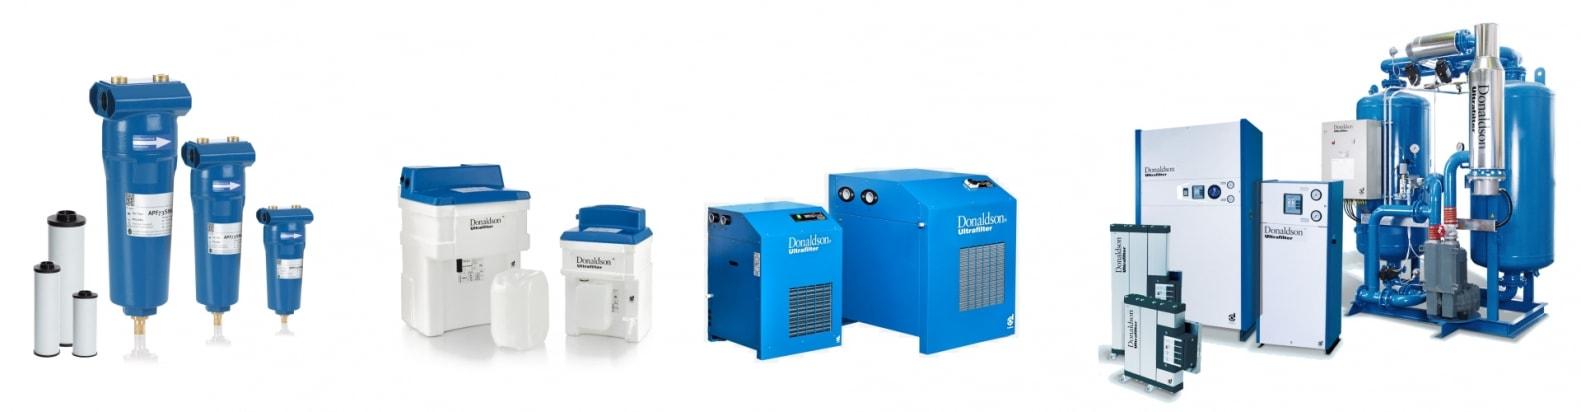 Boos Drucklufttechnik - Sortiment Druckluftaufbereitung